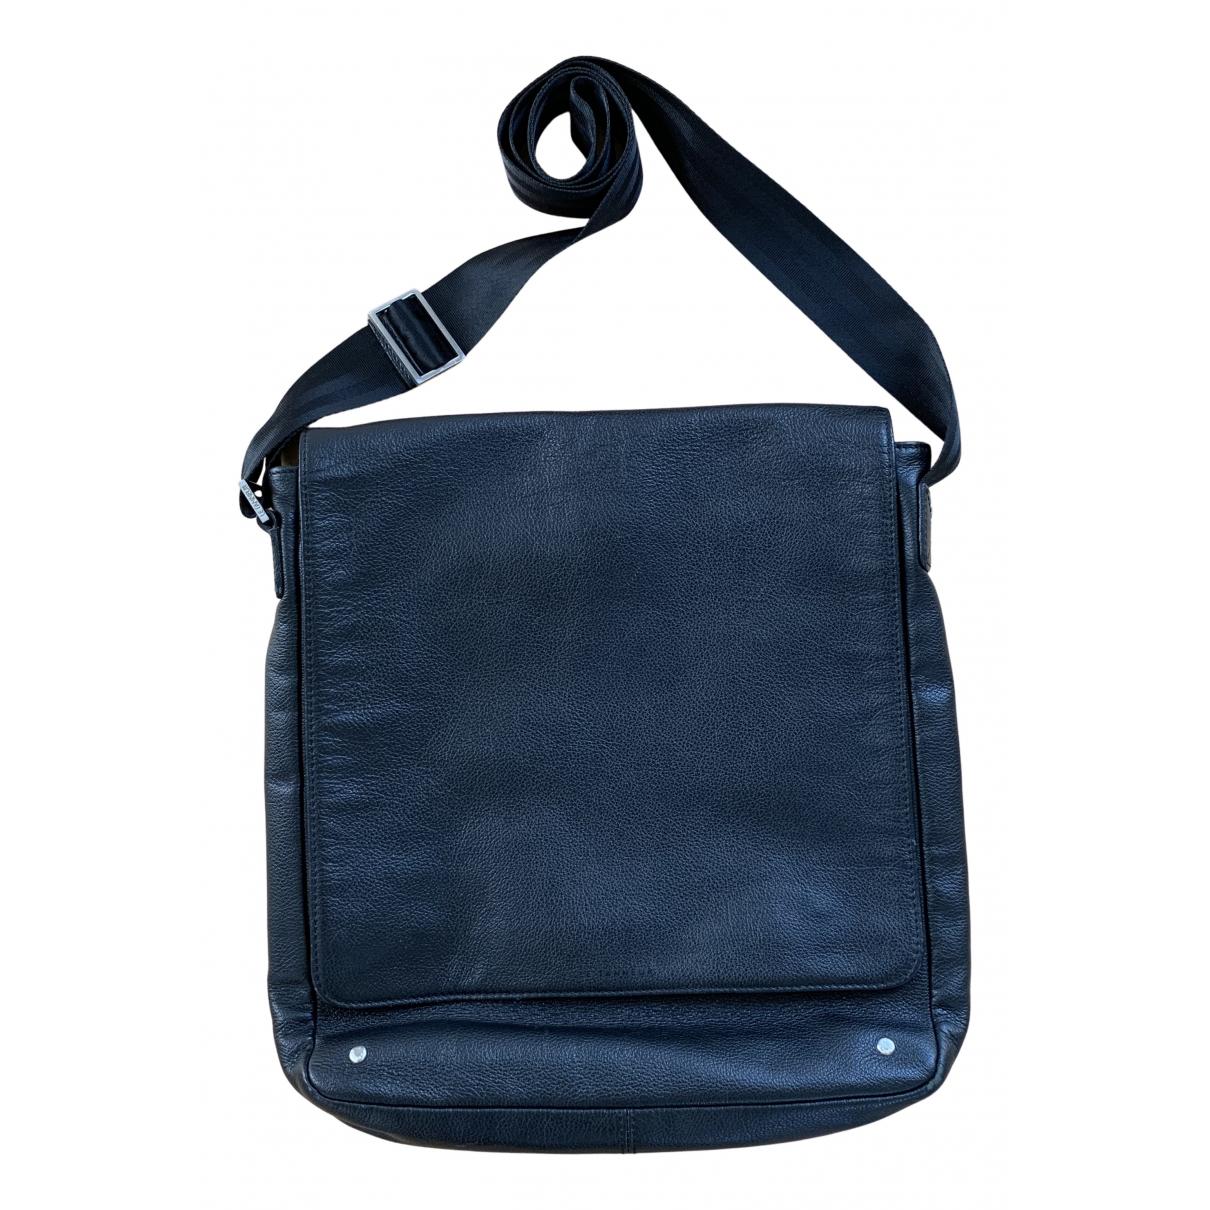 Le Tanneur N Black Leather bag for Men N